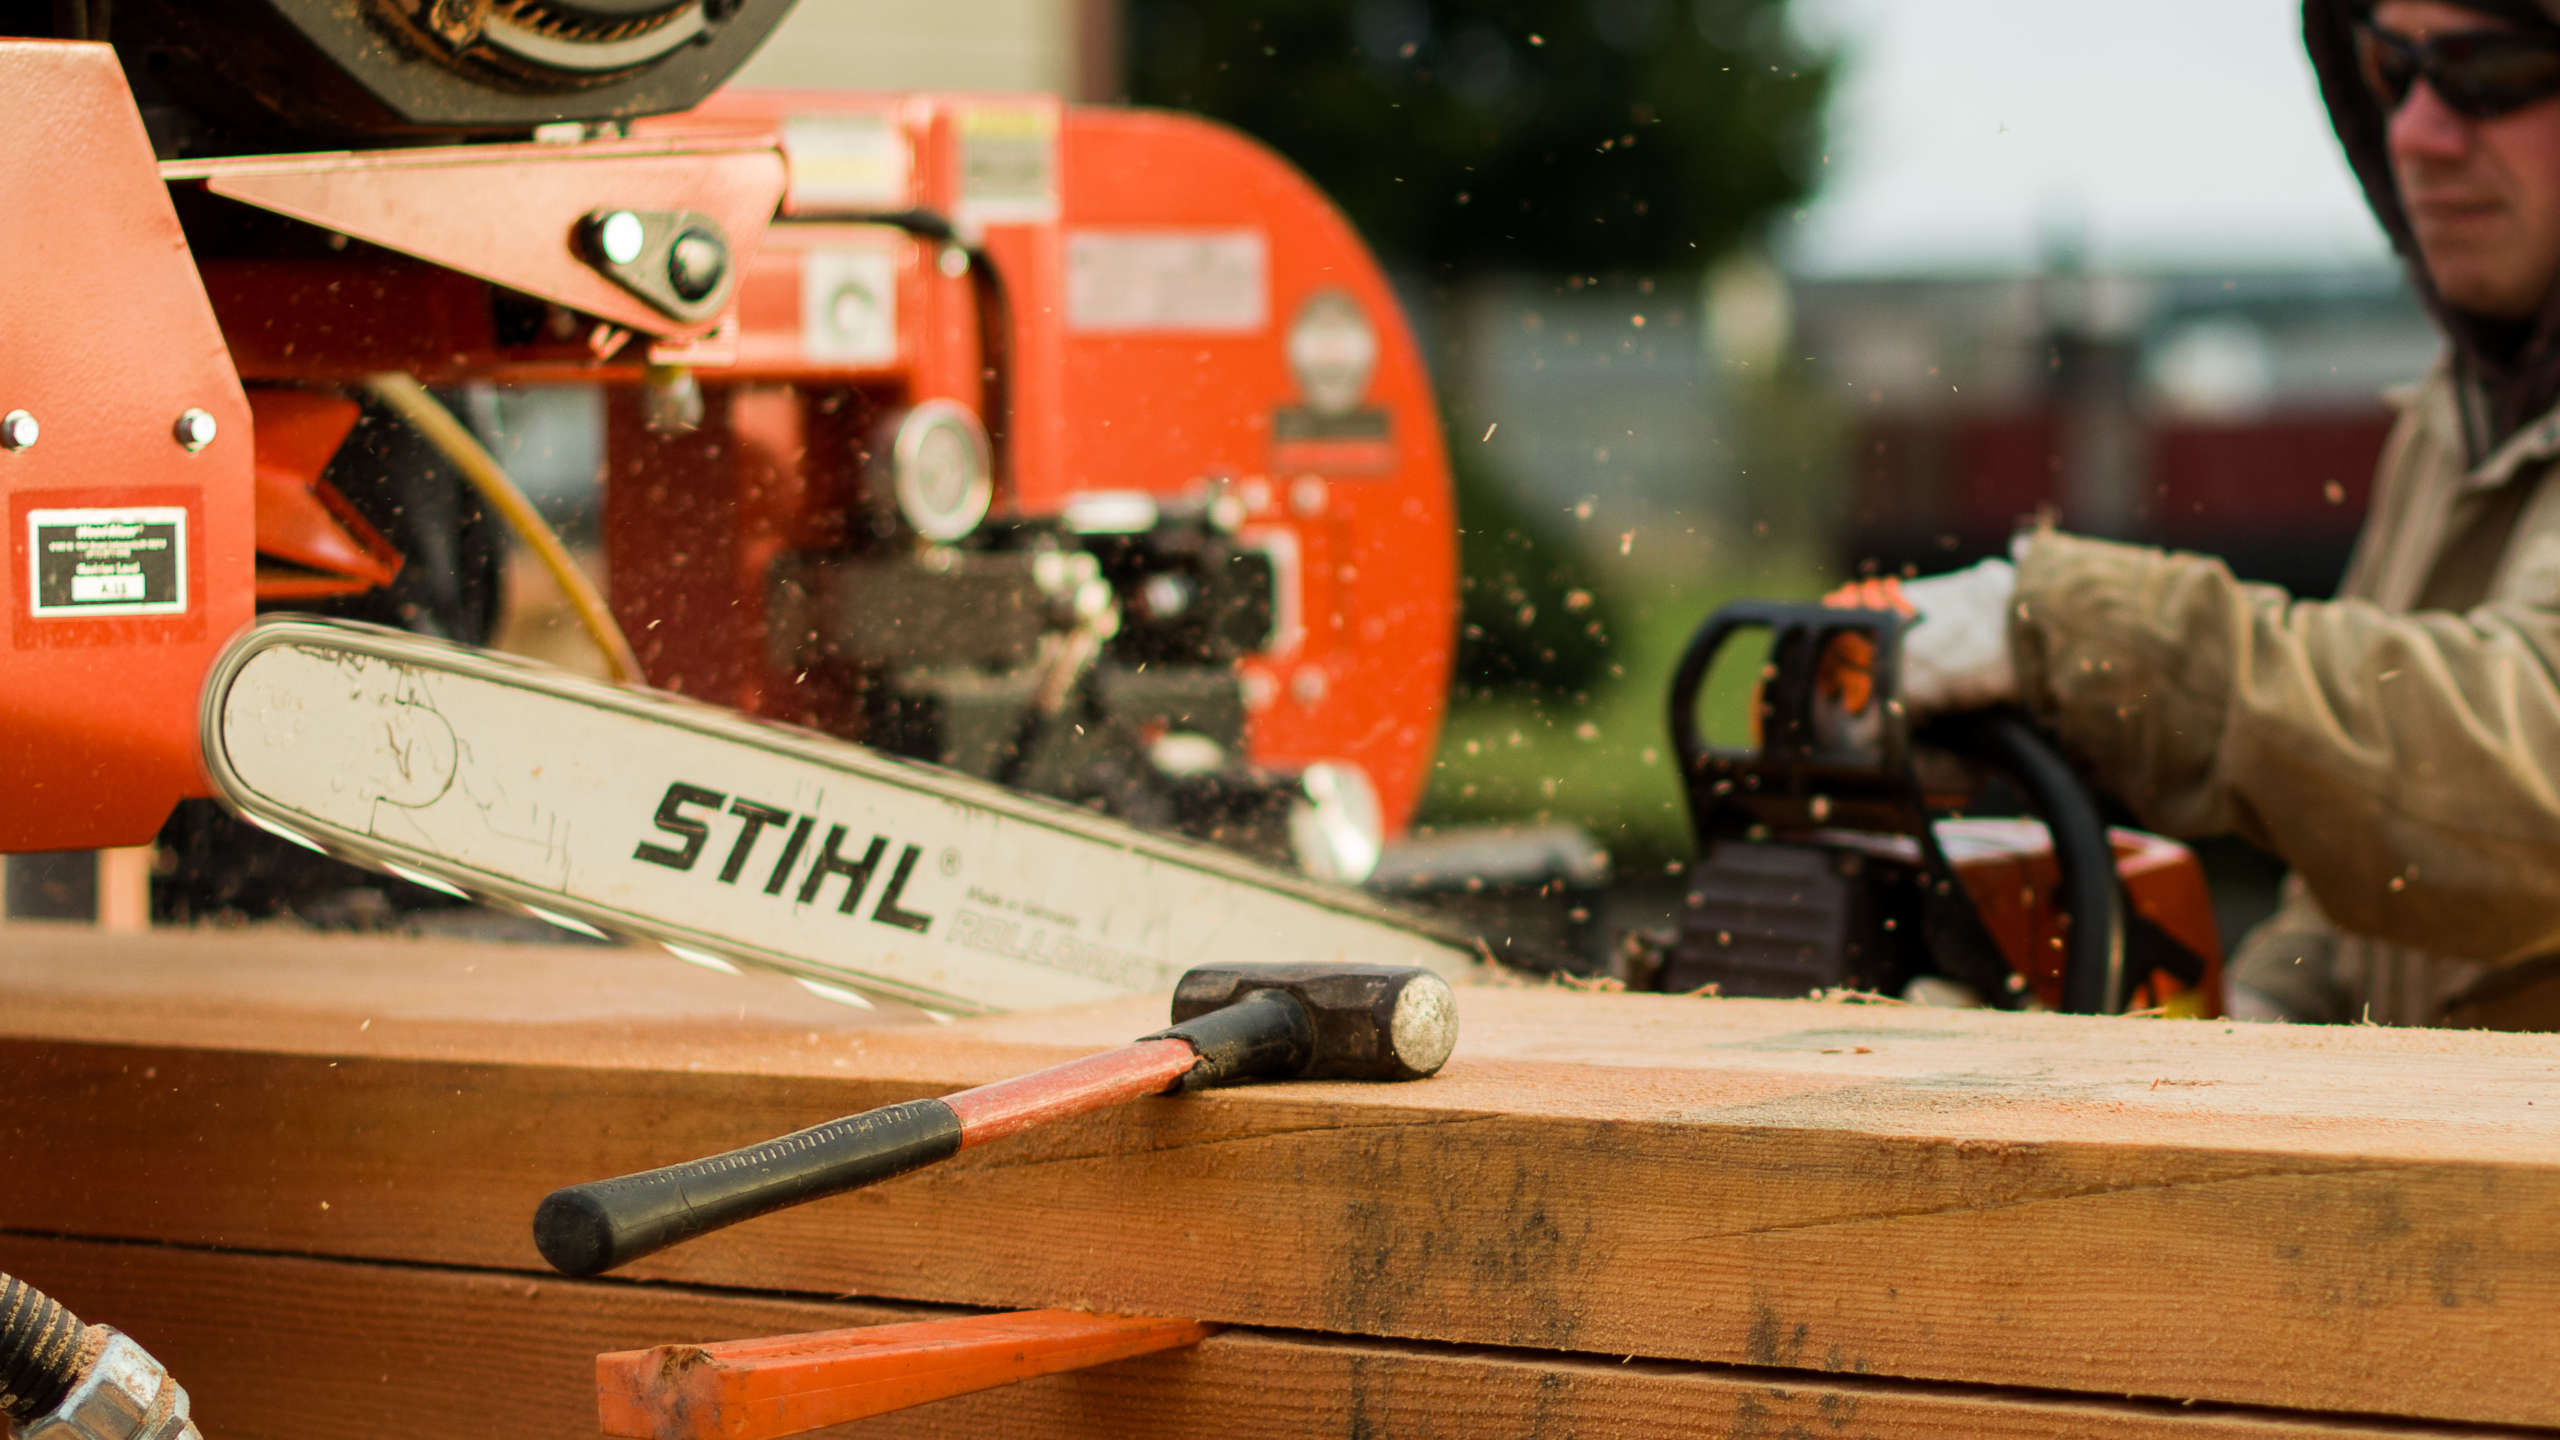 2020_ABG_SVS_Equipment_Wood-MizerStihl3